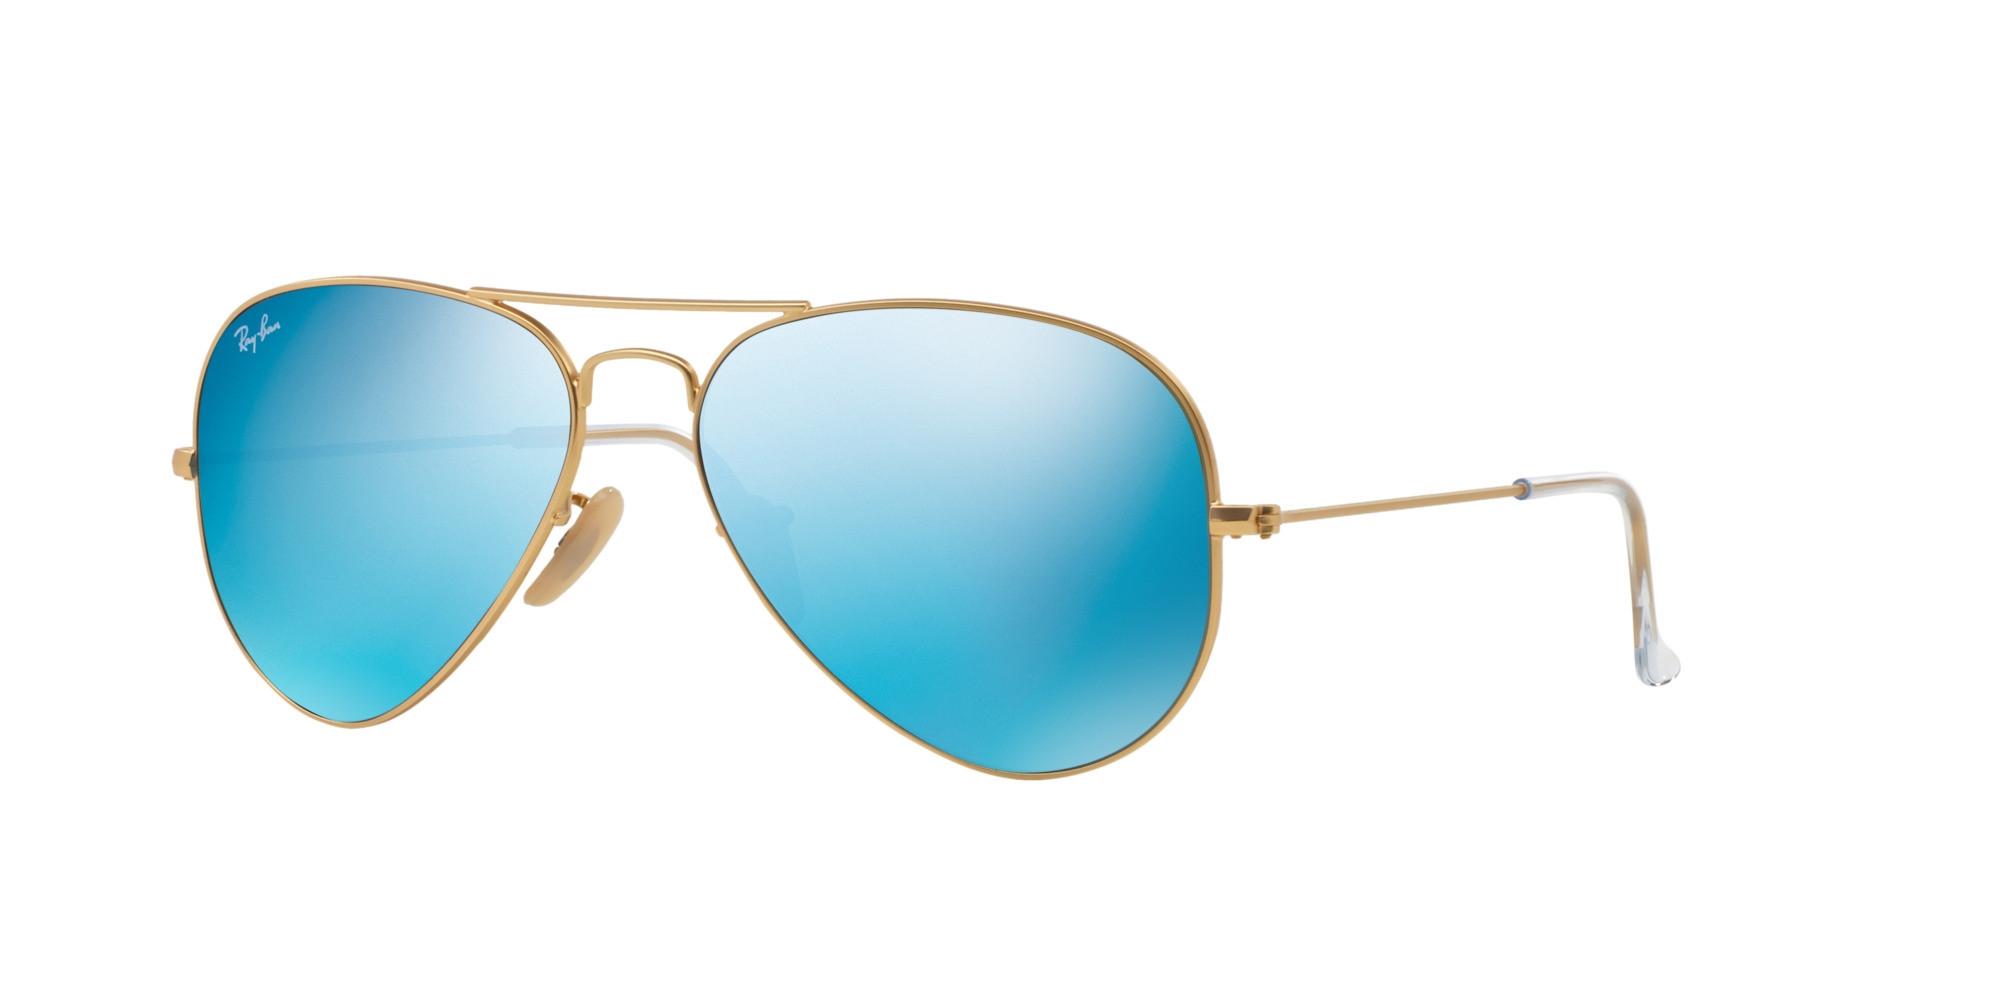 Gafas de sol RAY-BAN AVIATOR RB 3025 112/17